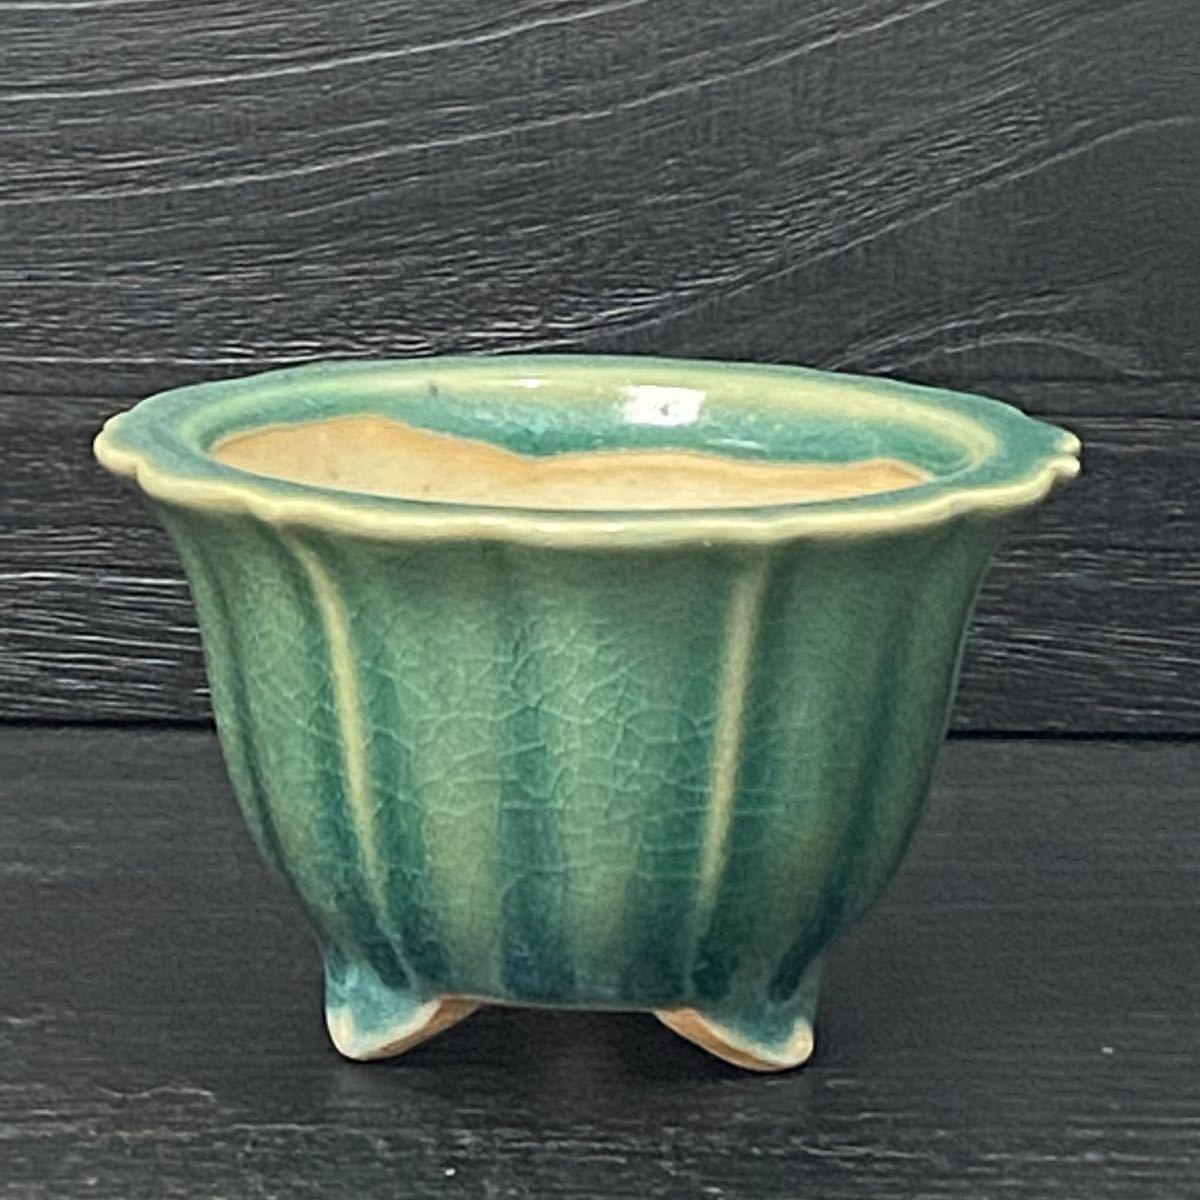 NC08-2 中国広東鉢 盆栽鉢 緑釉外縁輪花小鉢  中古品 3号 直径12cmx高さ7.5cm (ヒビ割れの様な模様は 割れでは有りません)